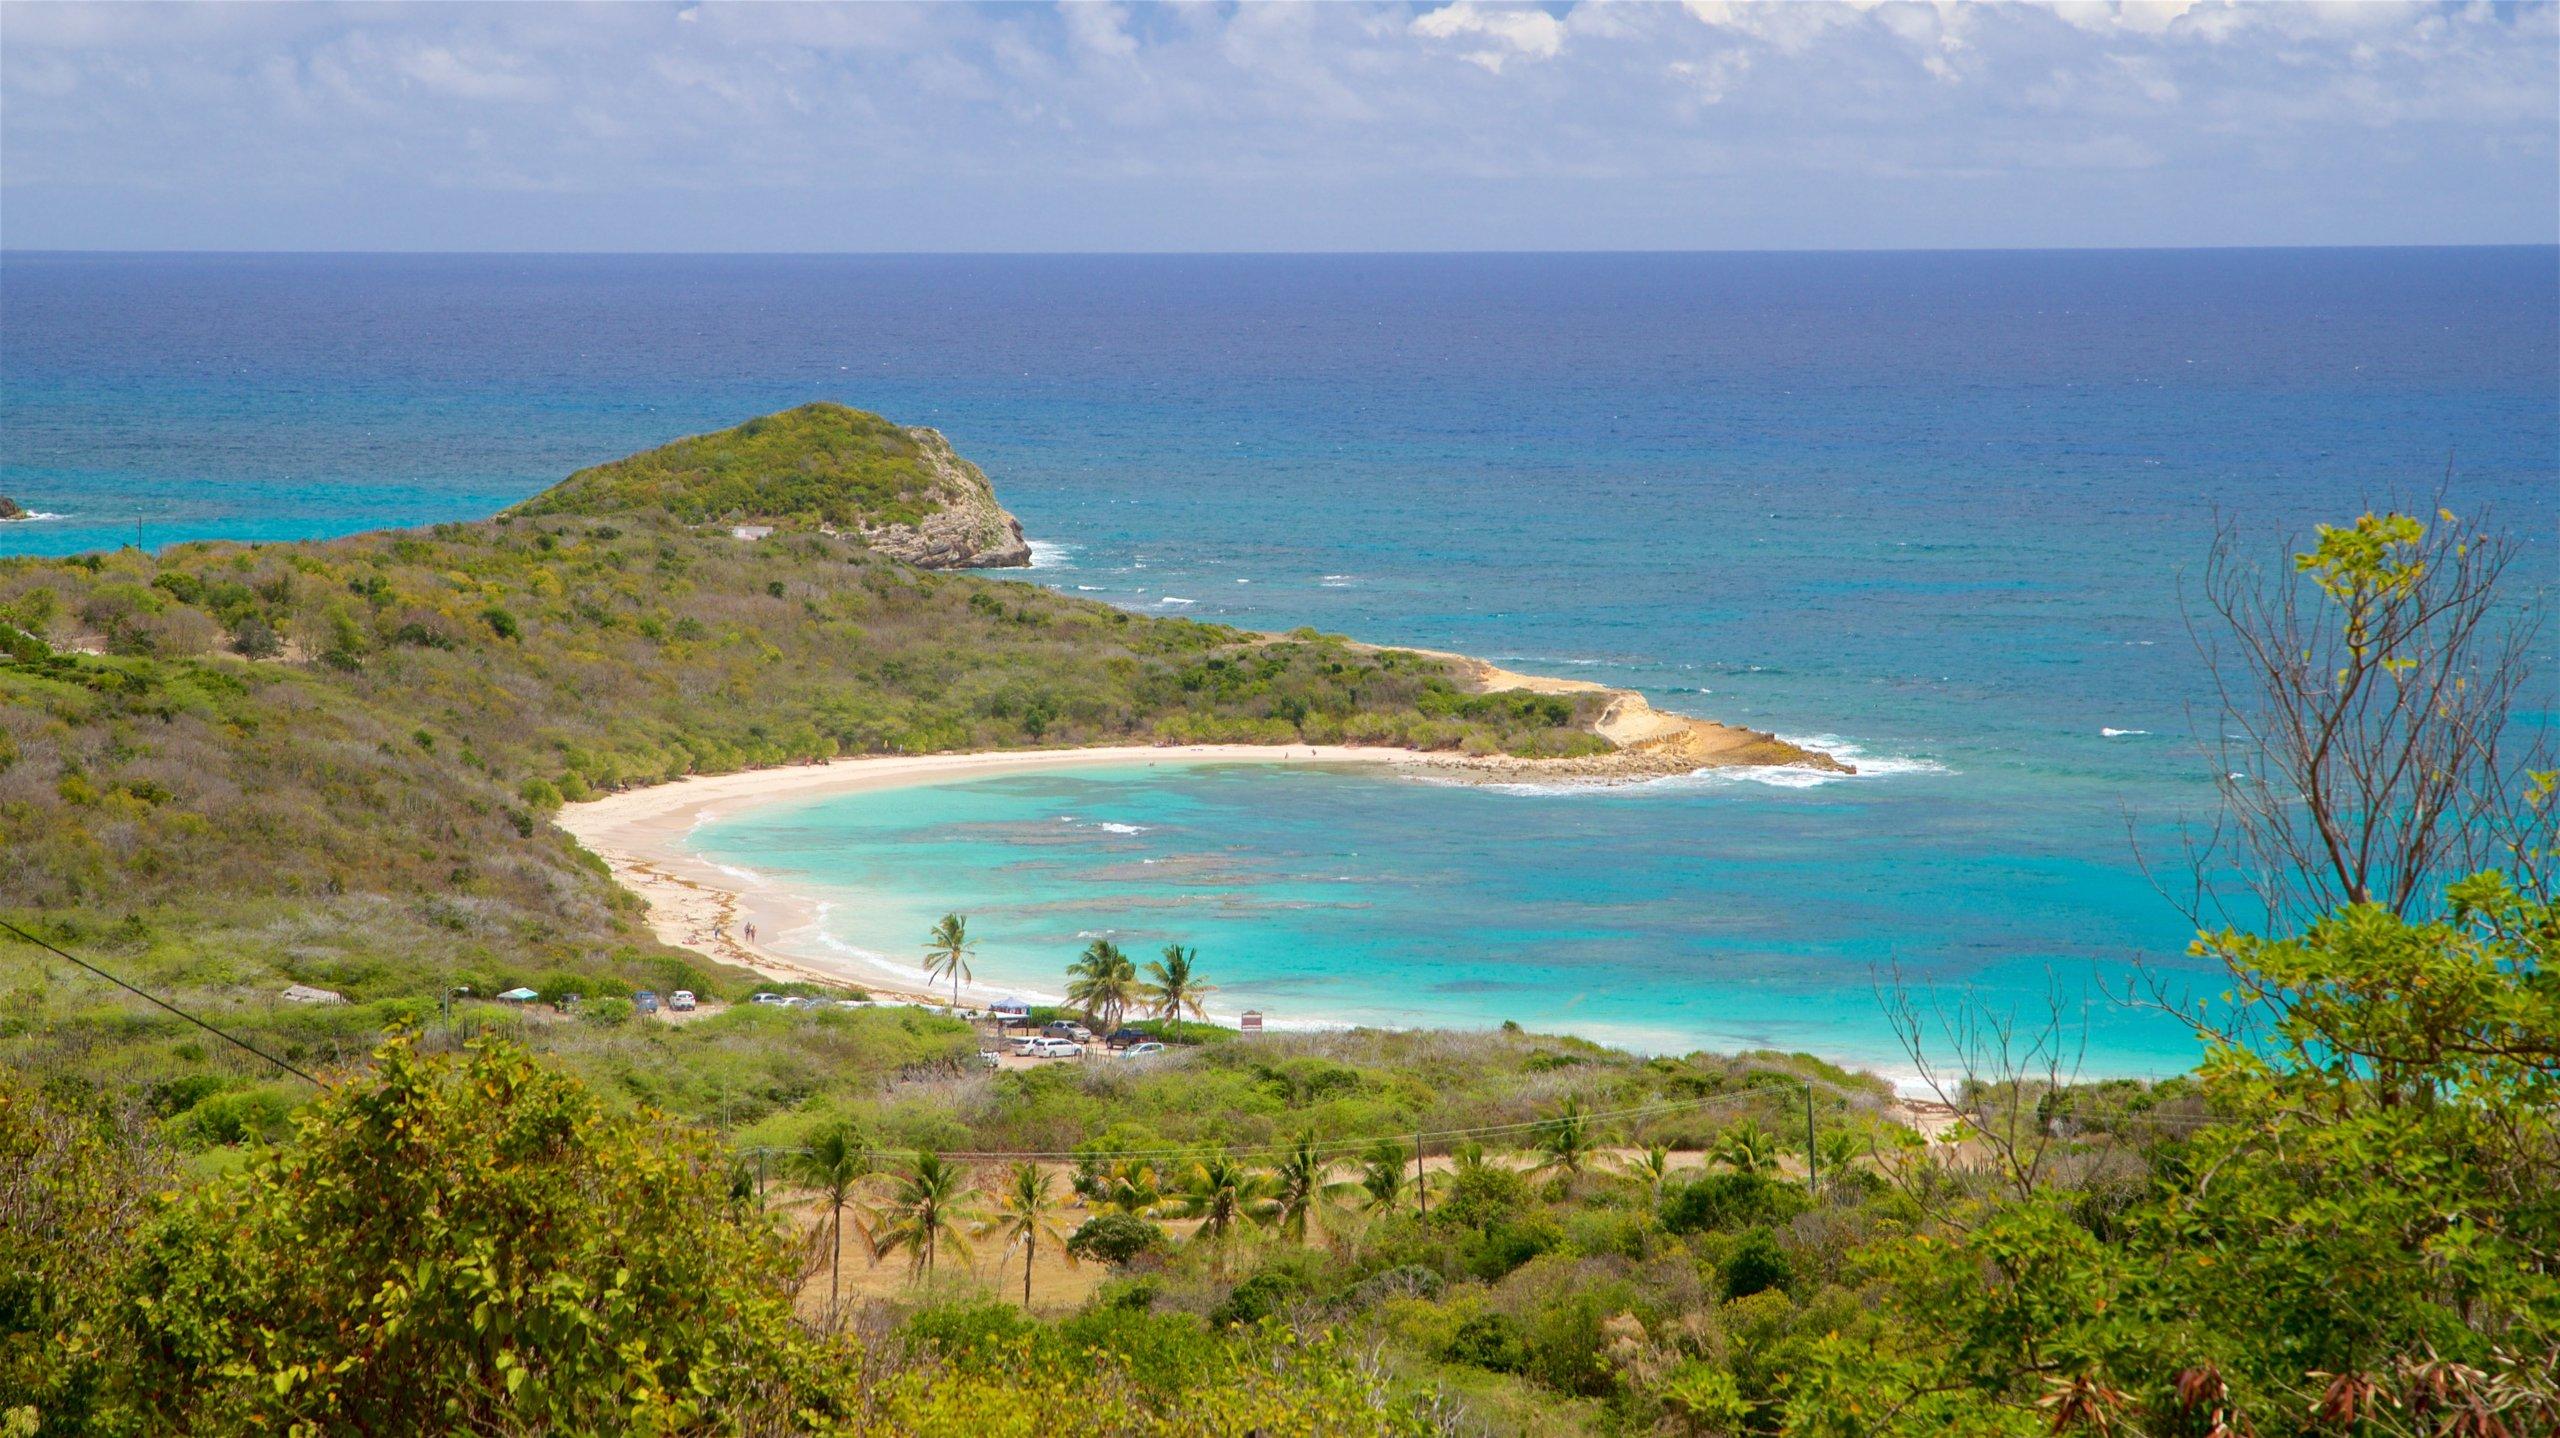 Half Moon Bay Beach, Freetown, Saint Philip, Antigua and Barbuda